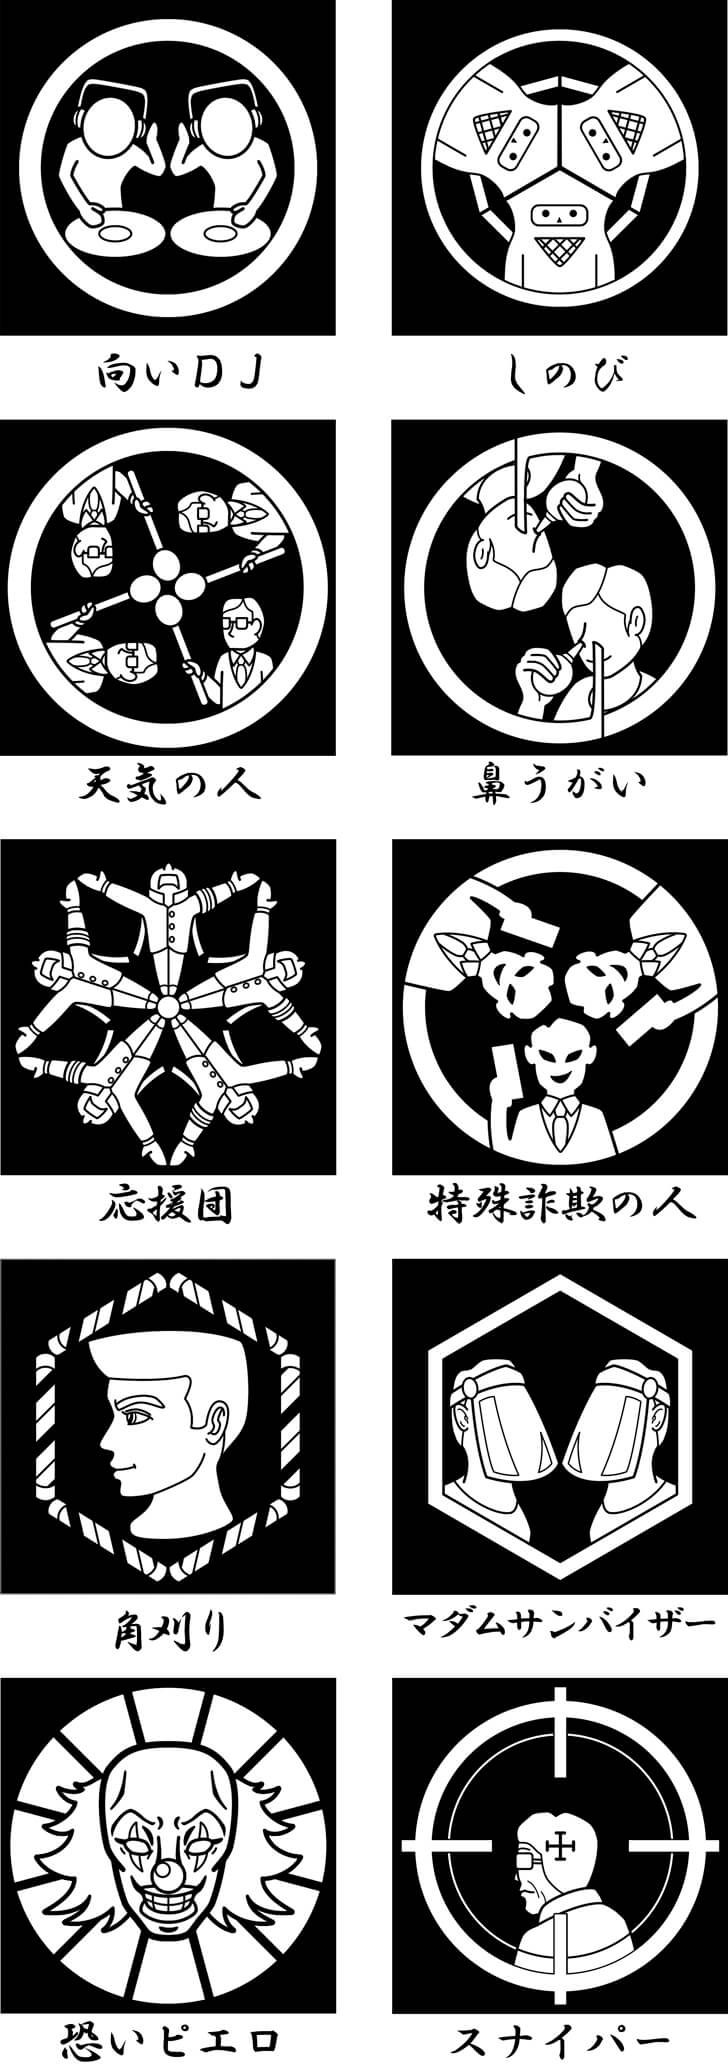 DJやスナイパー等の人物のオリジナル家紋